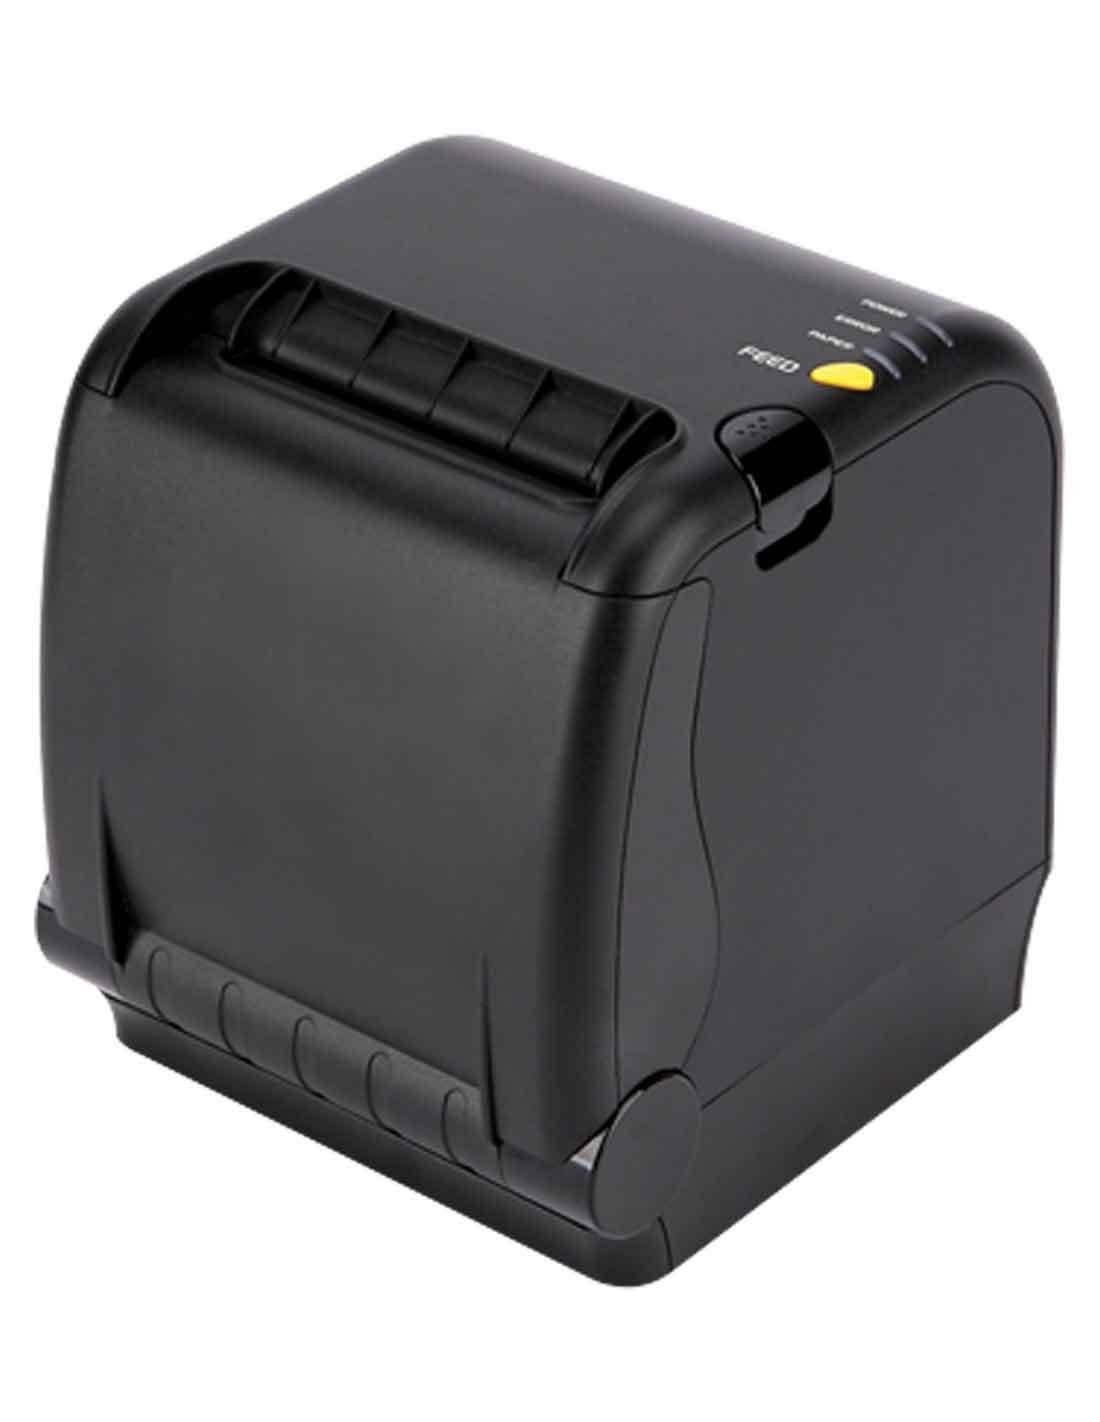 Sewoo SLK-TS400 POS Printer Dubai Online Store